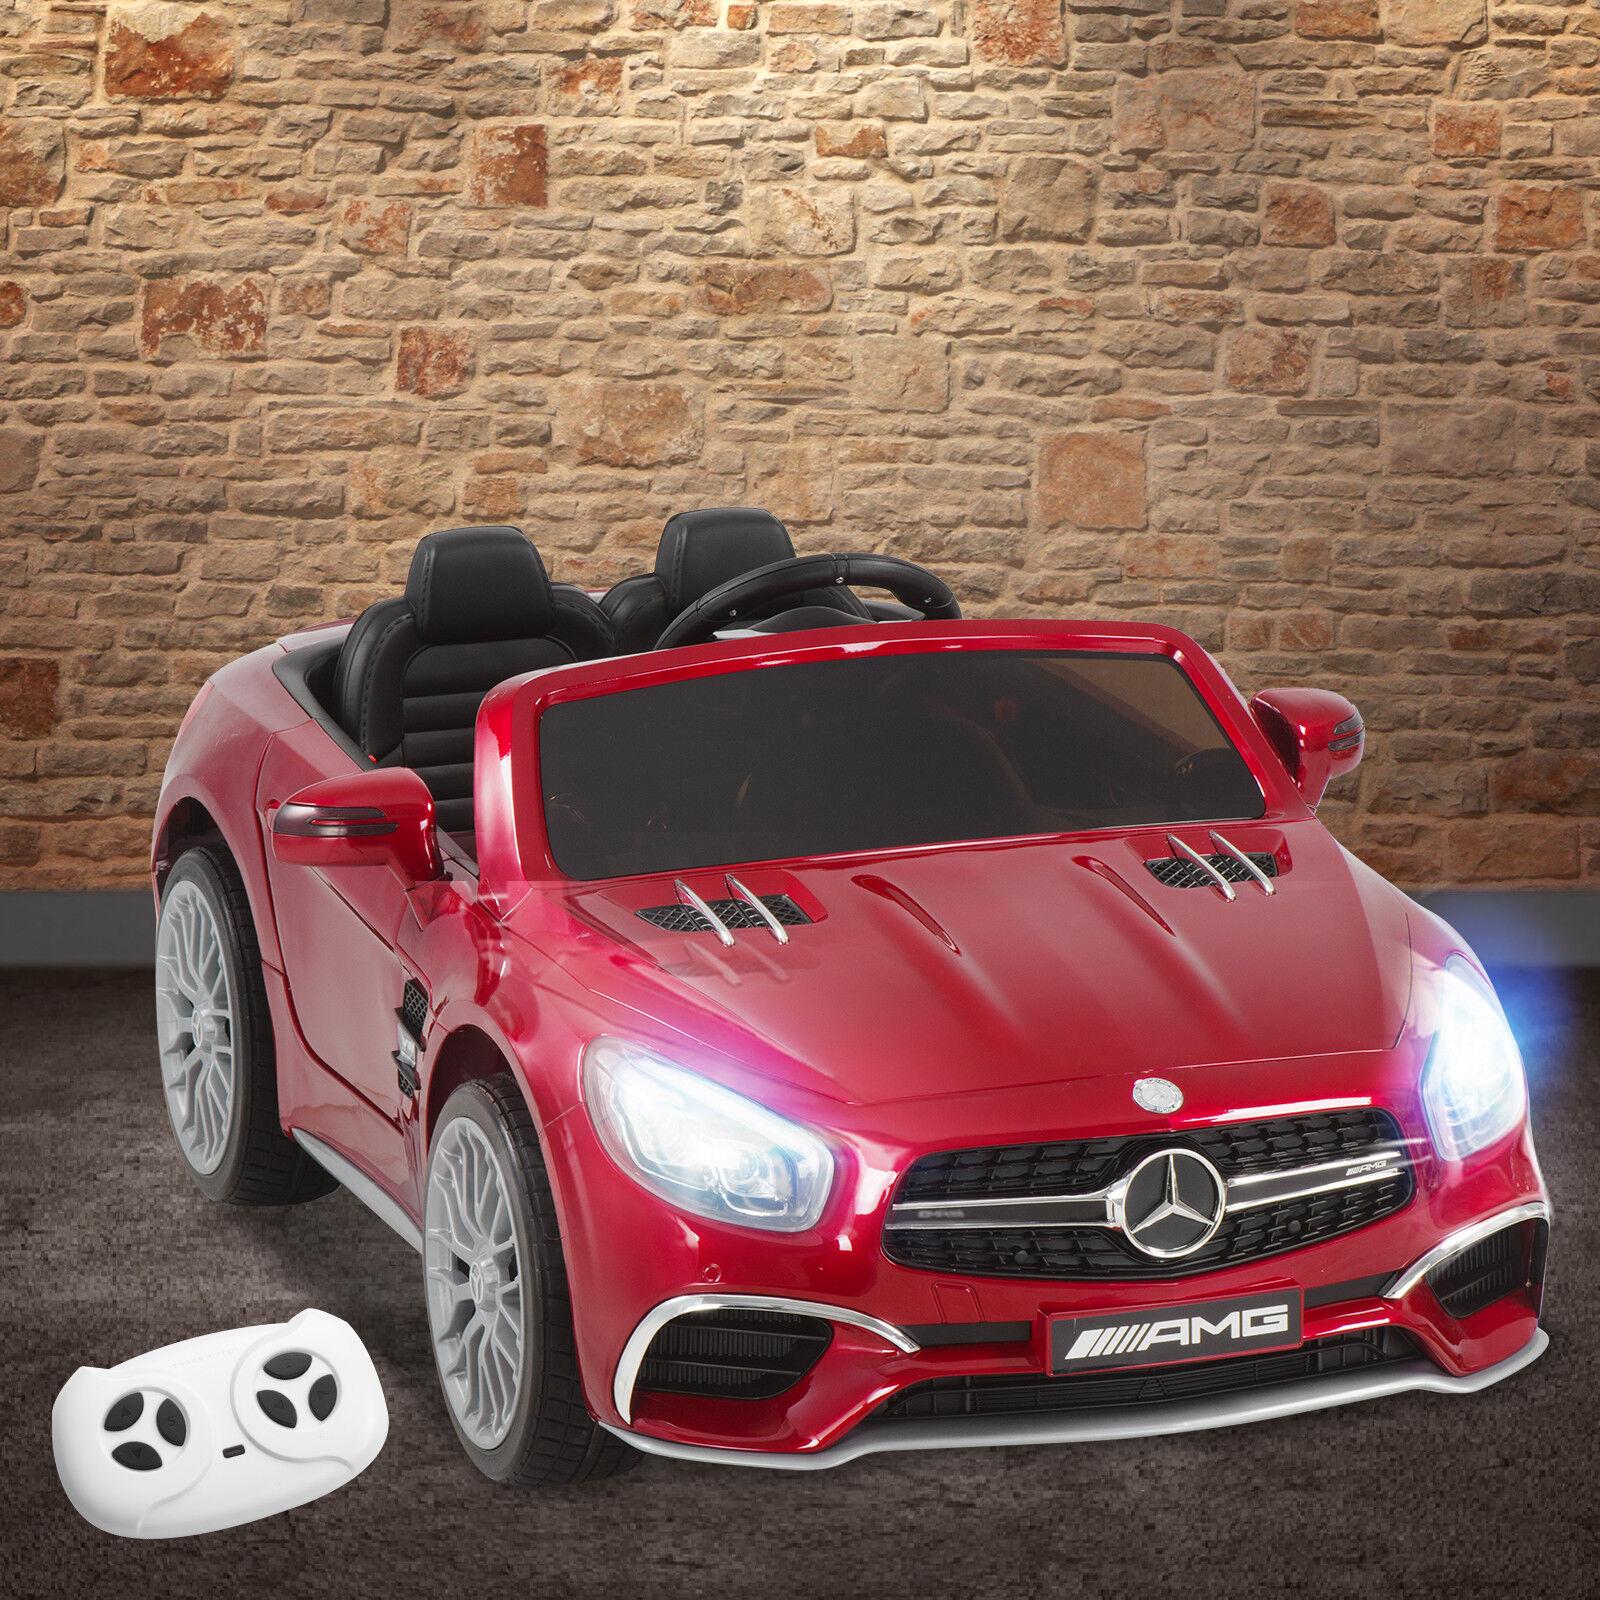 Mercedes Benz AMG SL65 Red 12V Battery Kids Ride On Car Licensed Remote Control